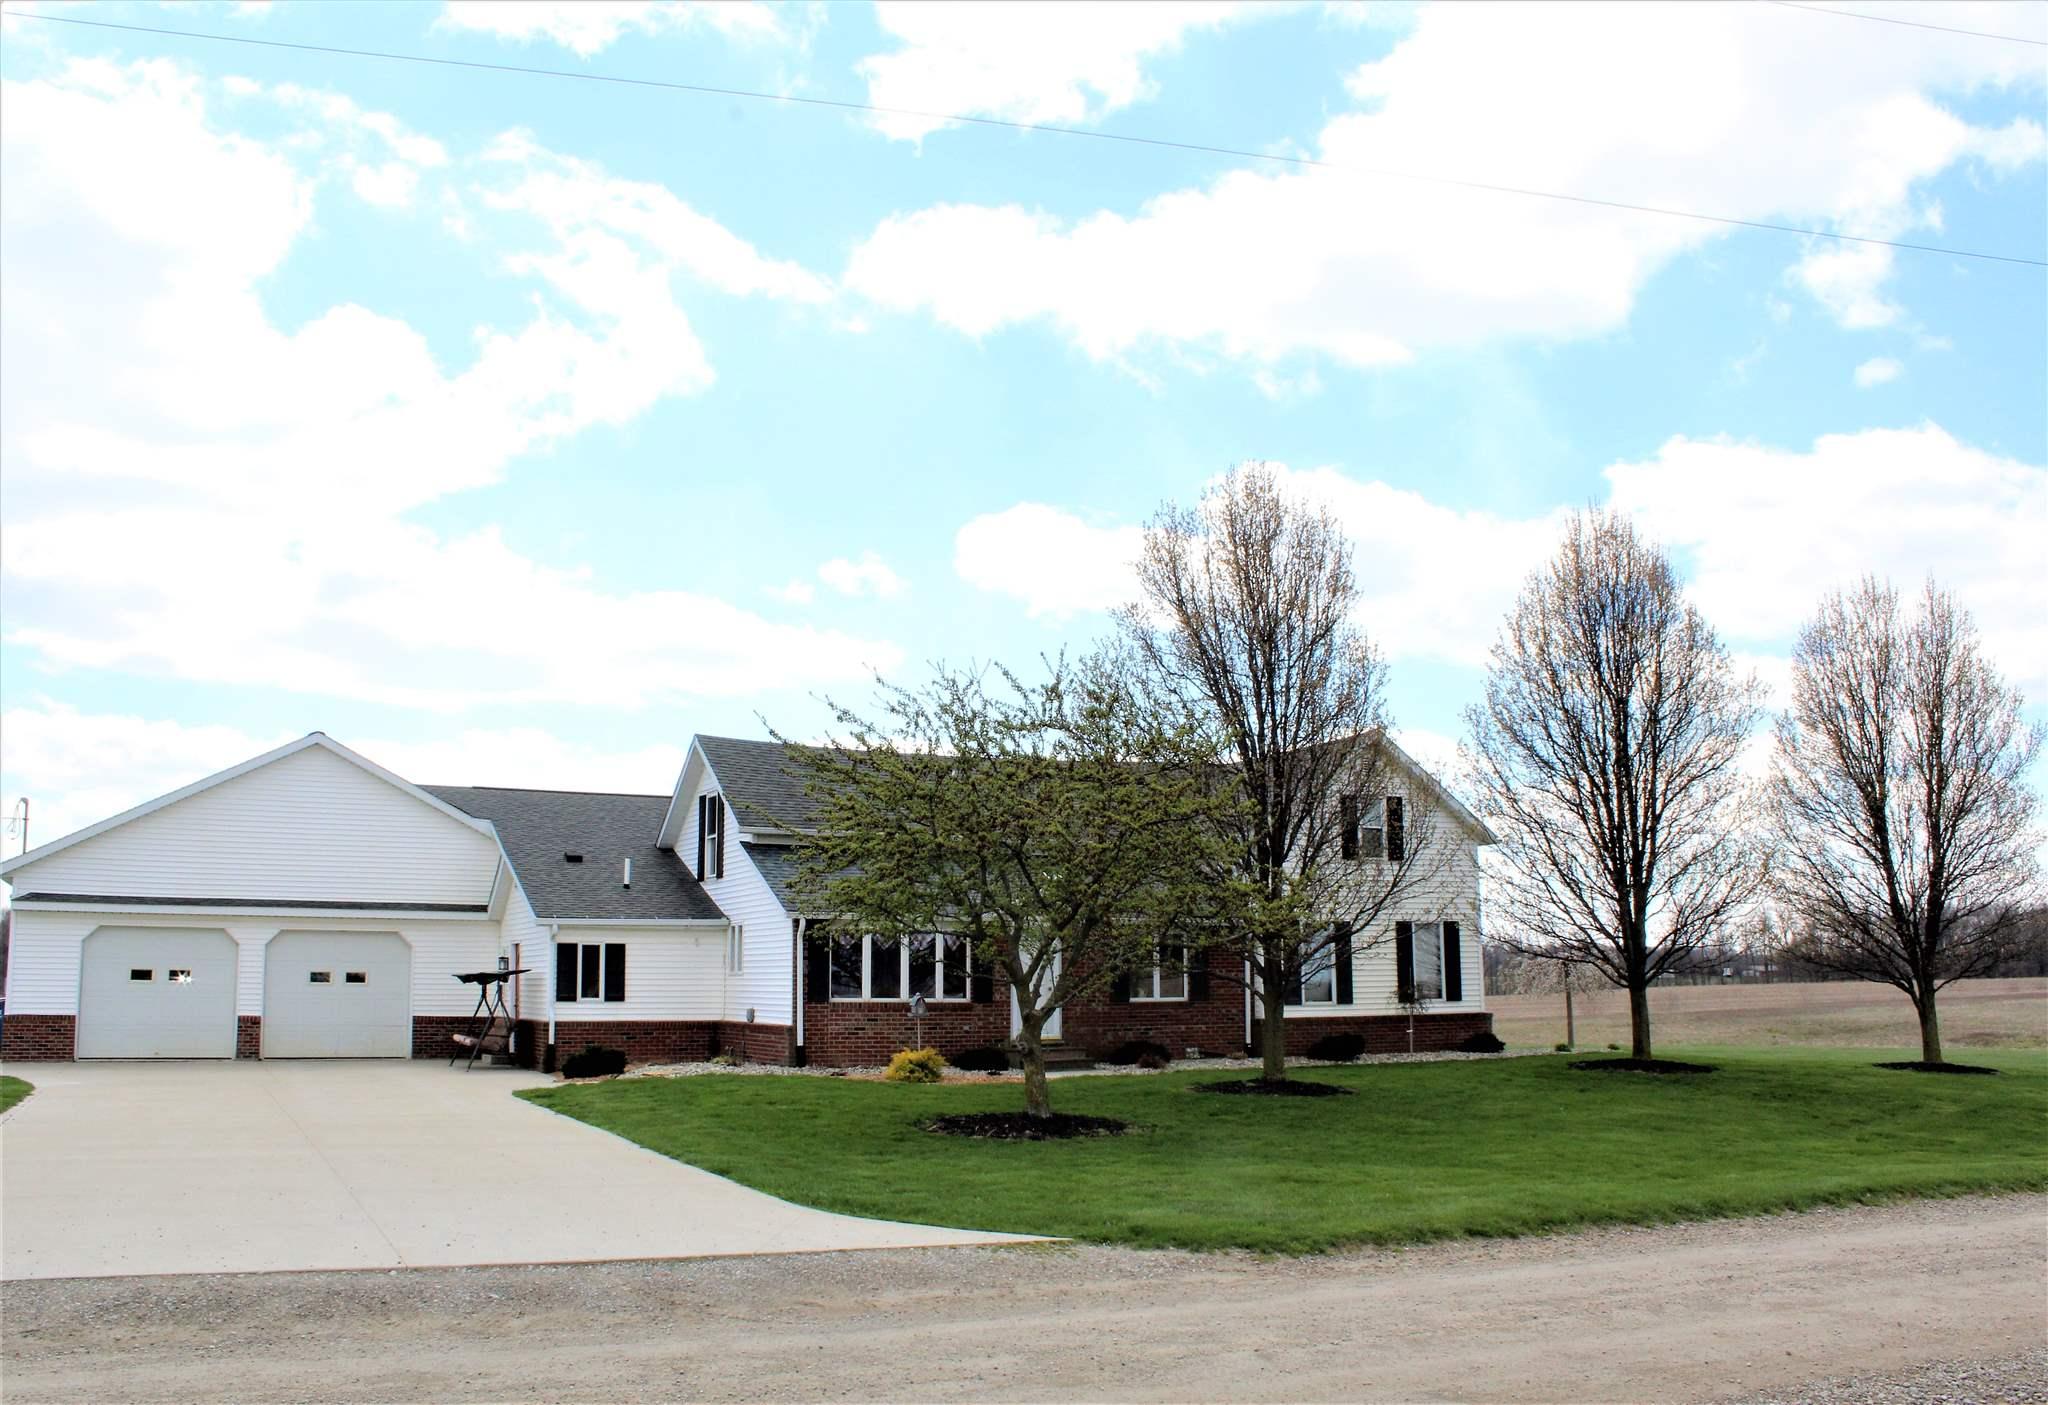 6986 County Road 46, Butler, IN 46721